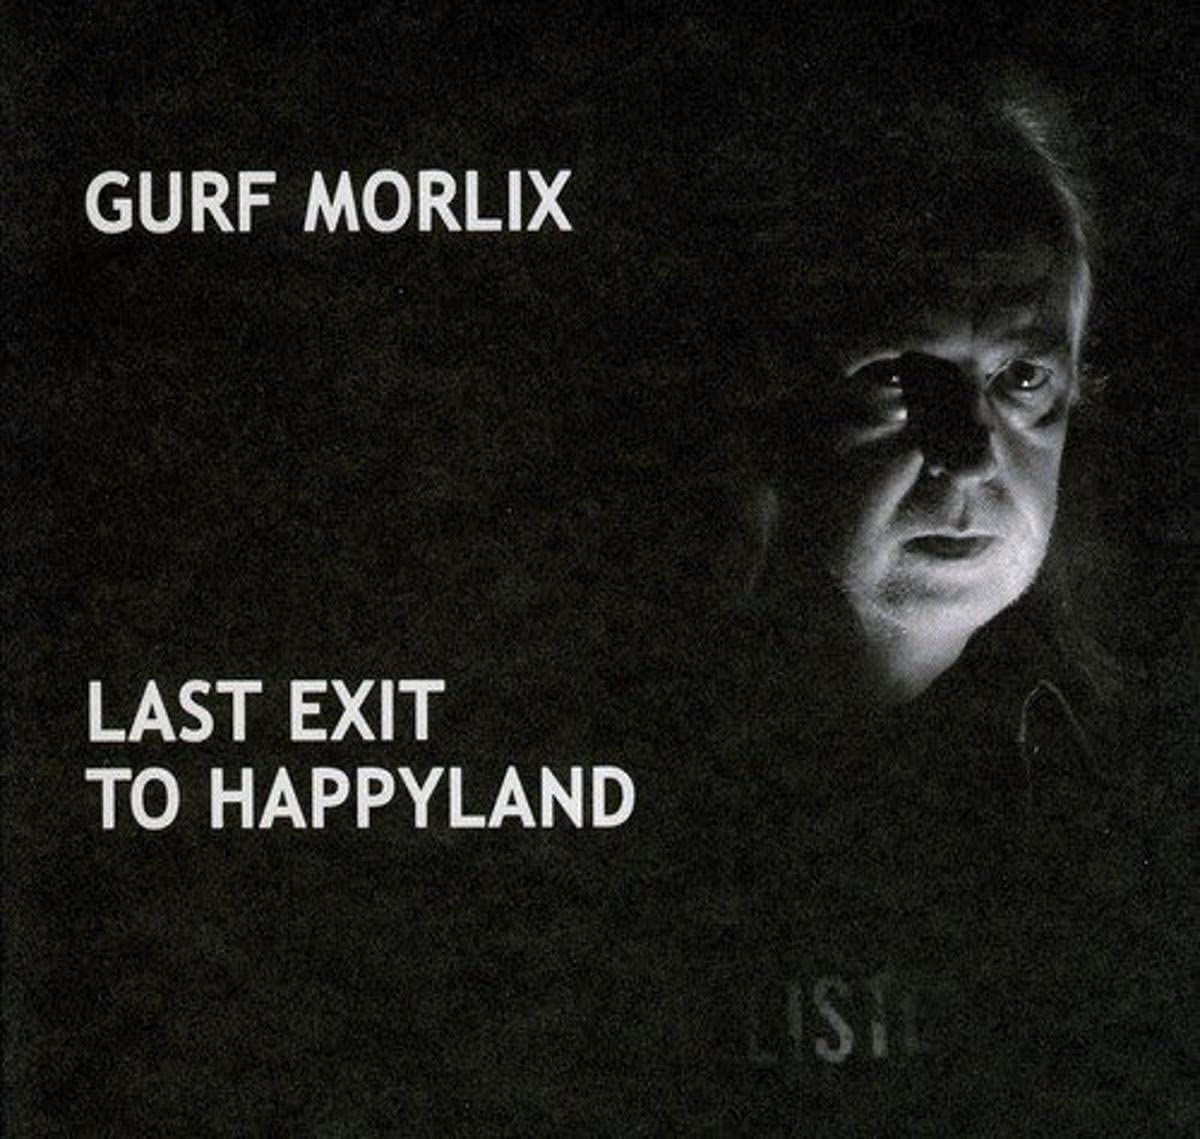 Indefinitely Last sale Exit Happyland to